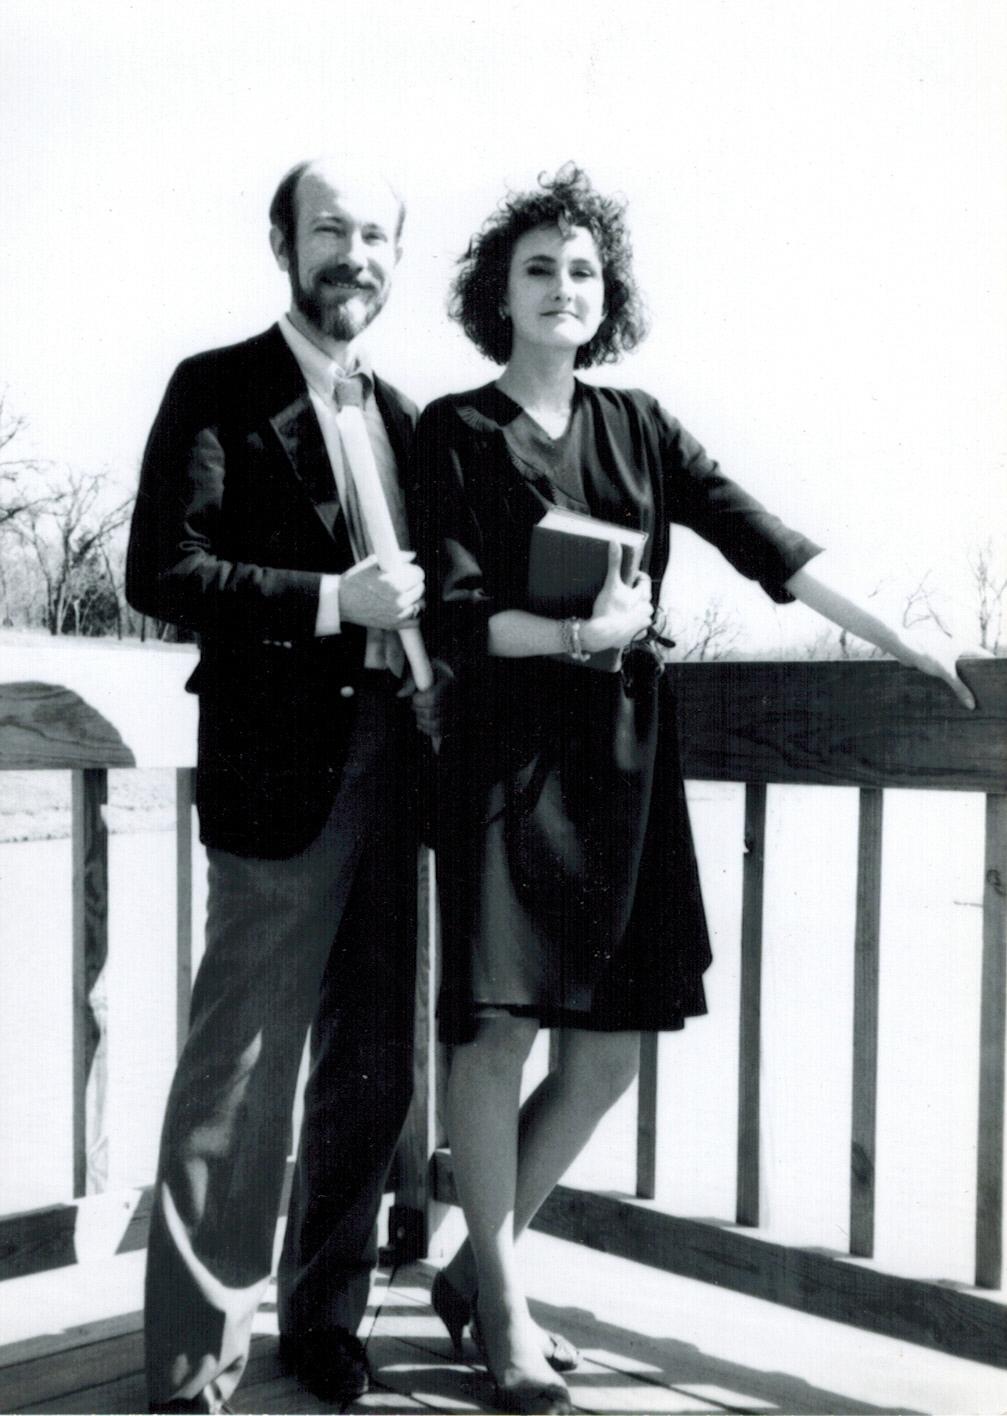 Jack & Kathryn O'Meara in 1985